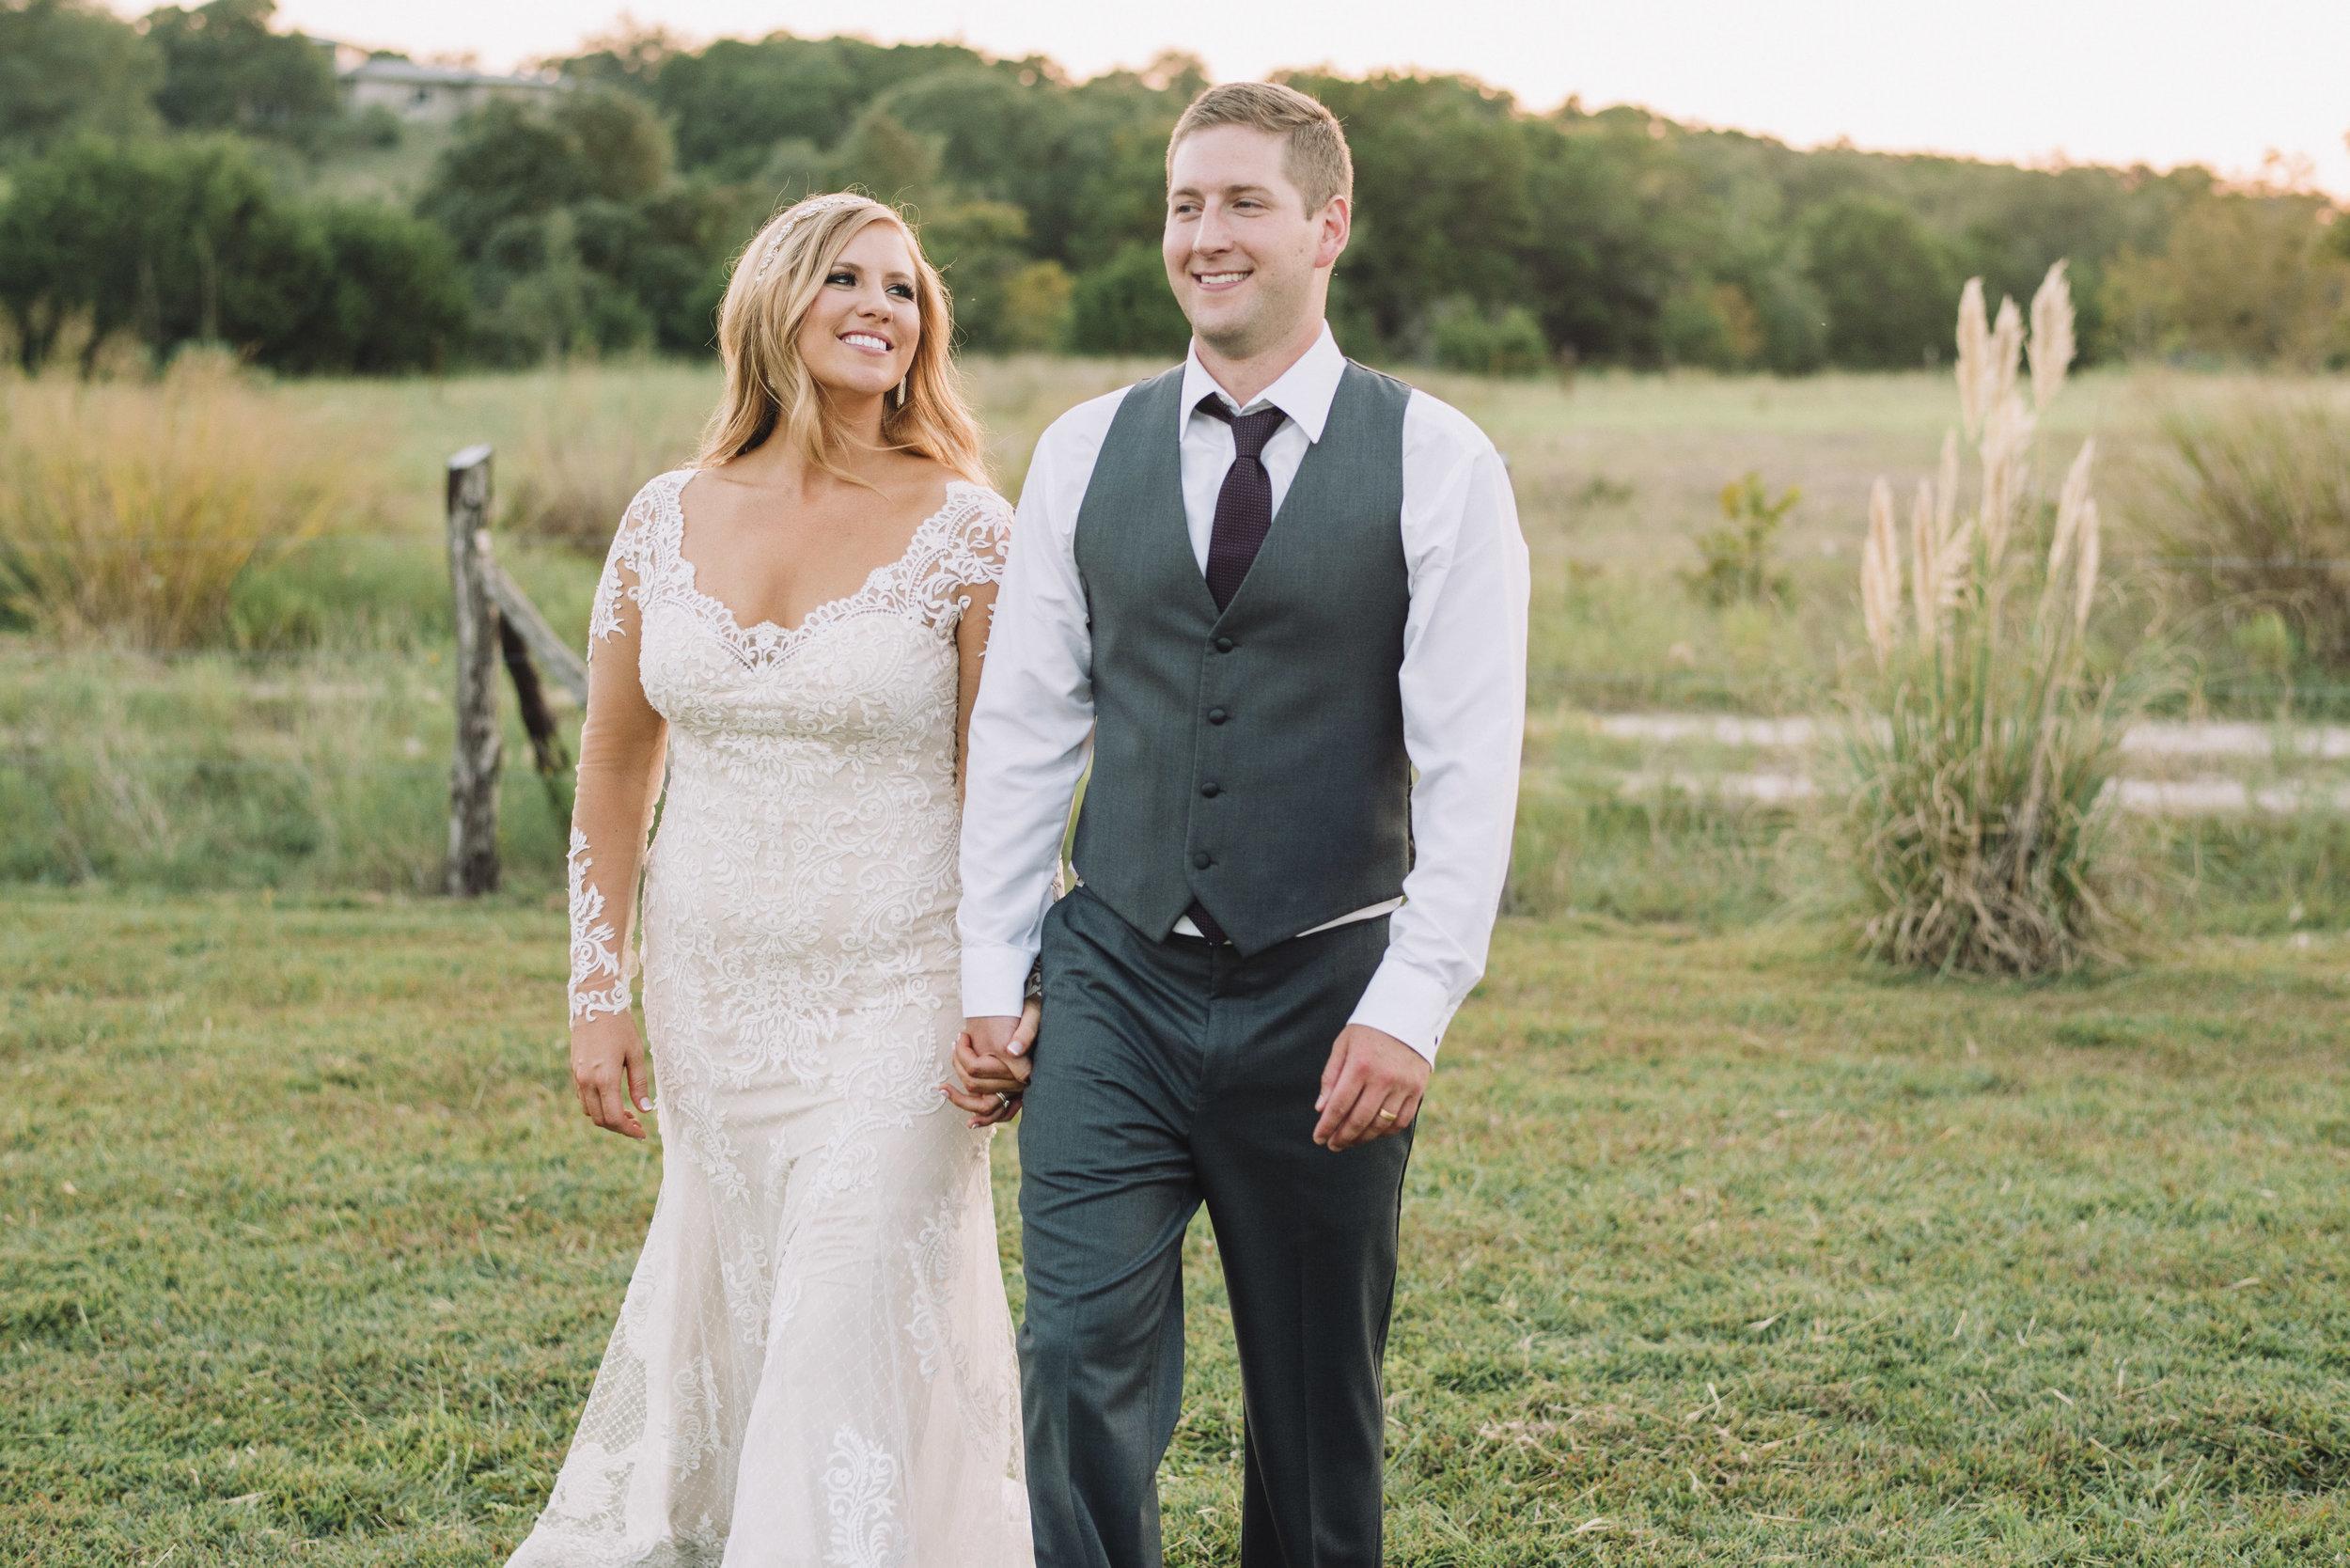 wedding photographer austin.JPG